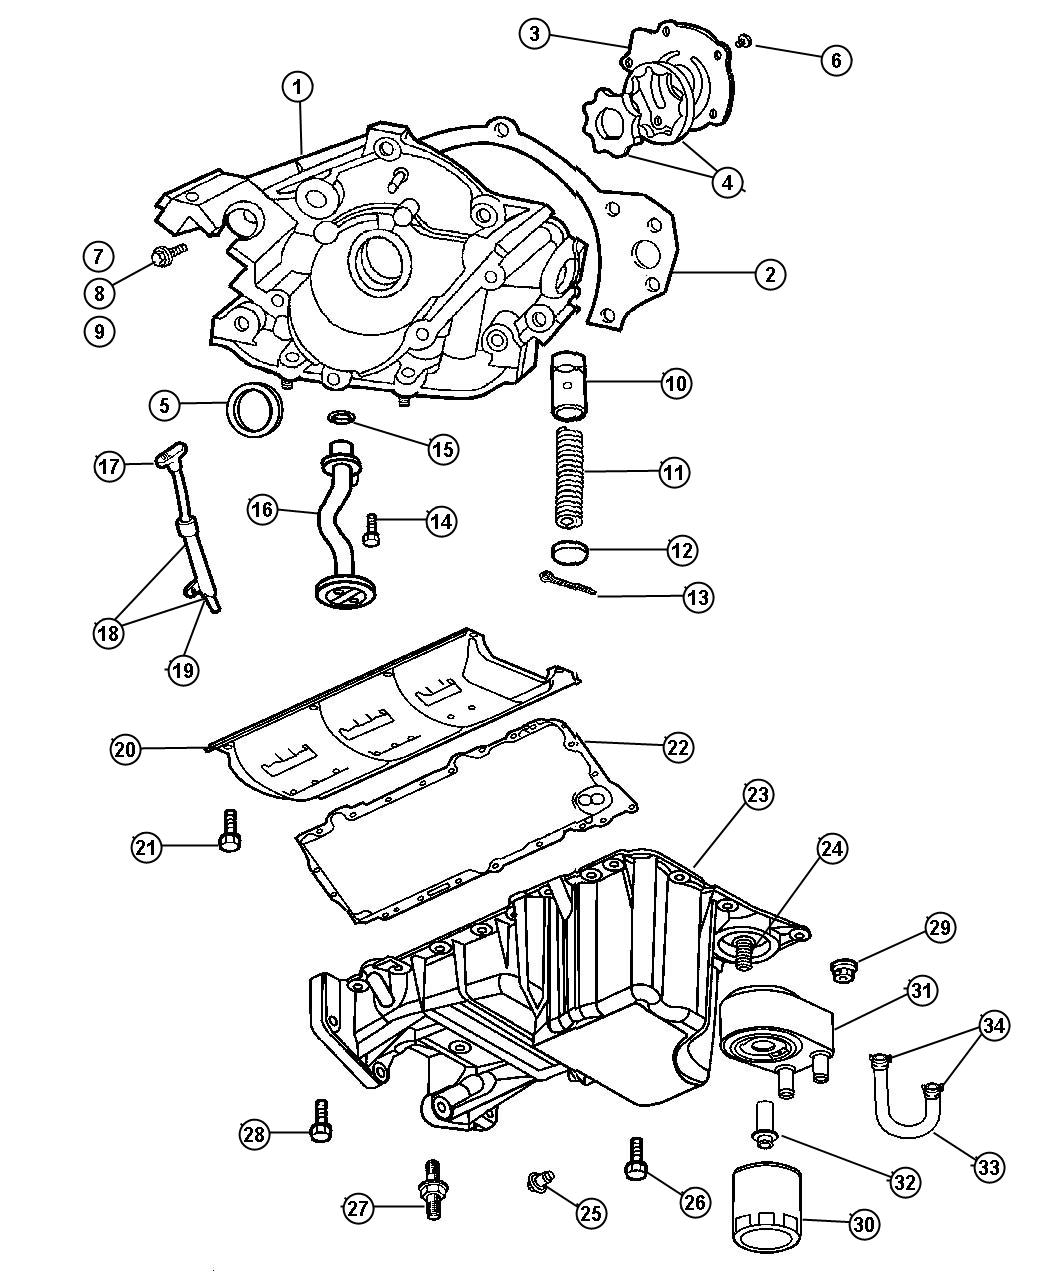 2007 Chrysler 300 Pan. Oil. [dgj] rear wheel drive. Engine